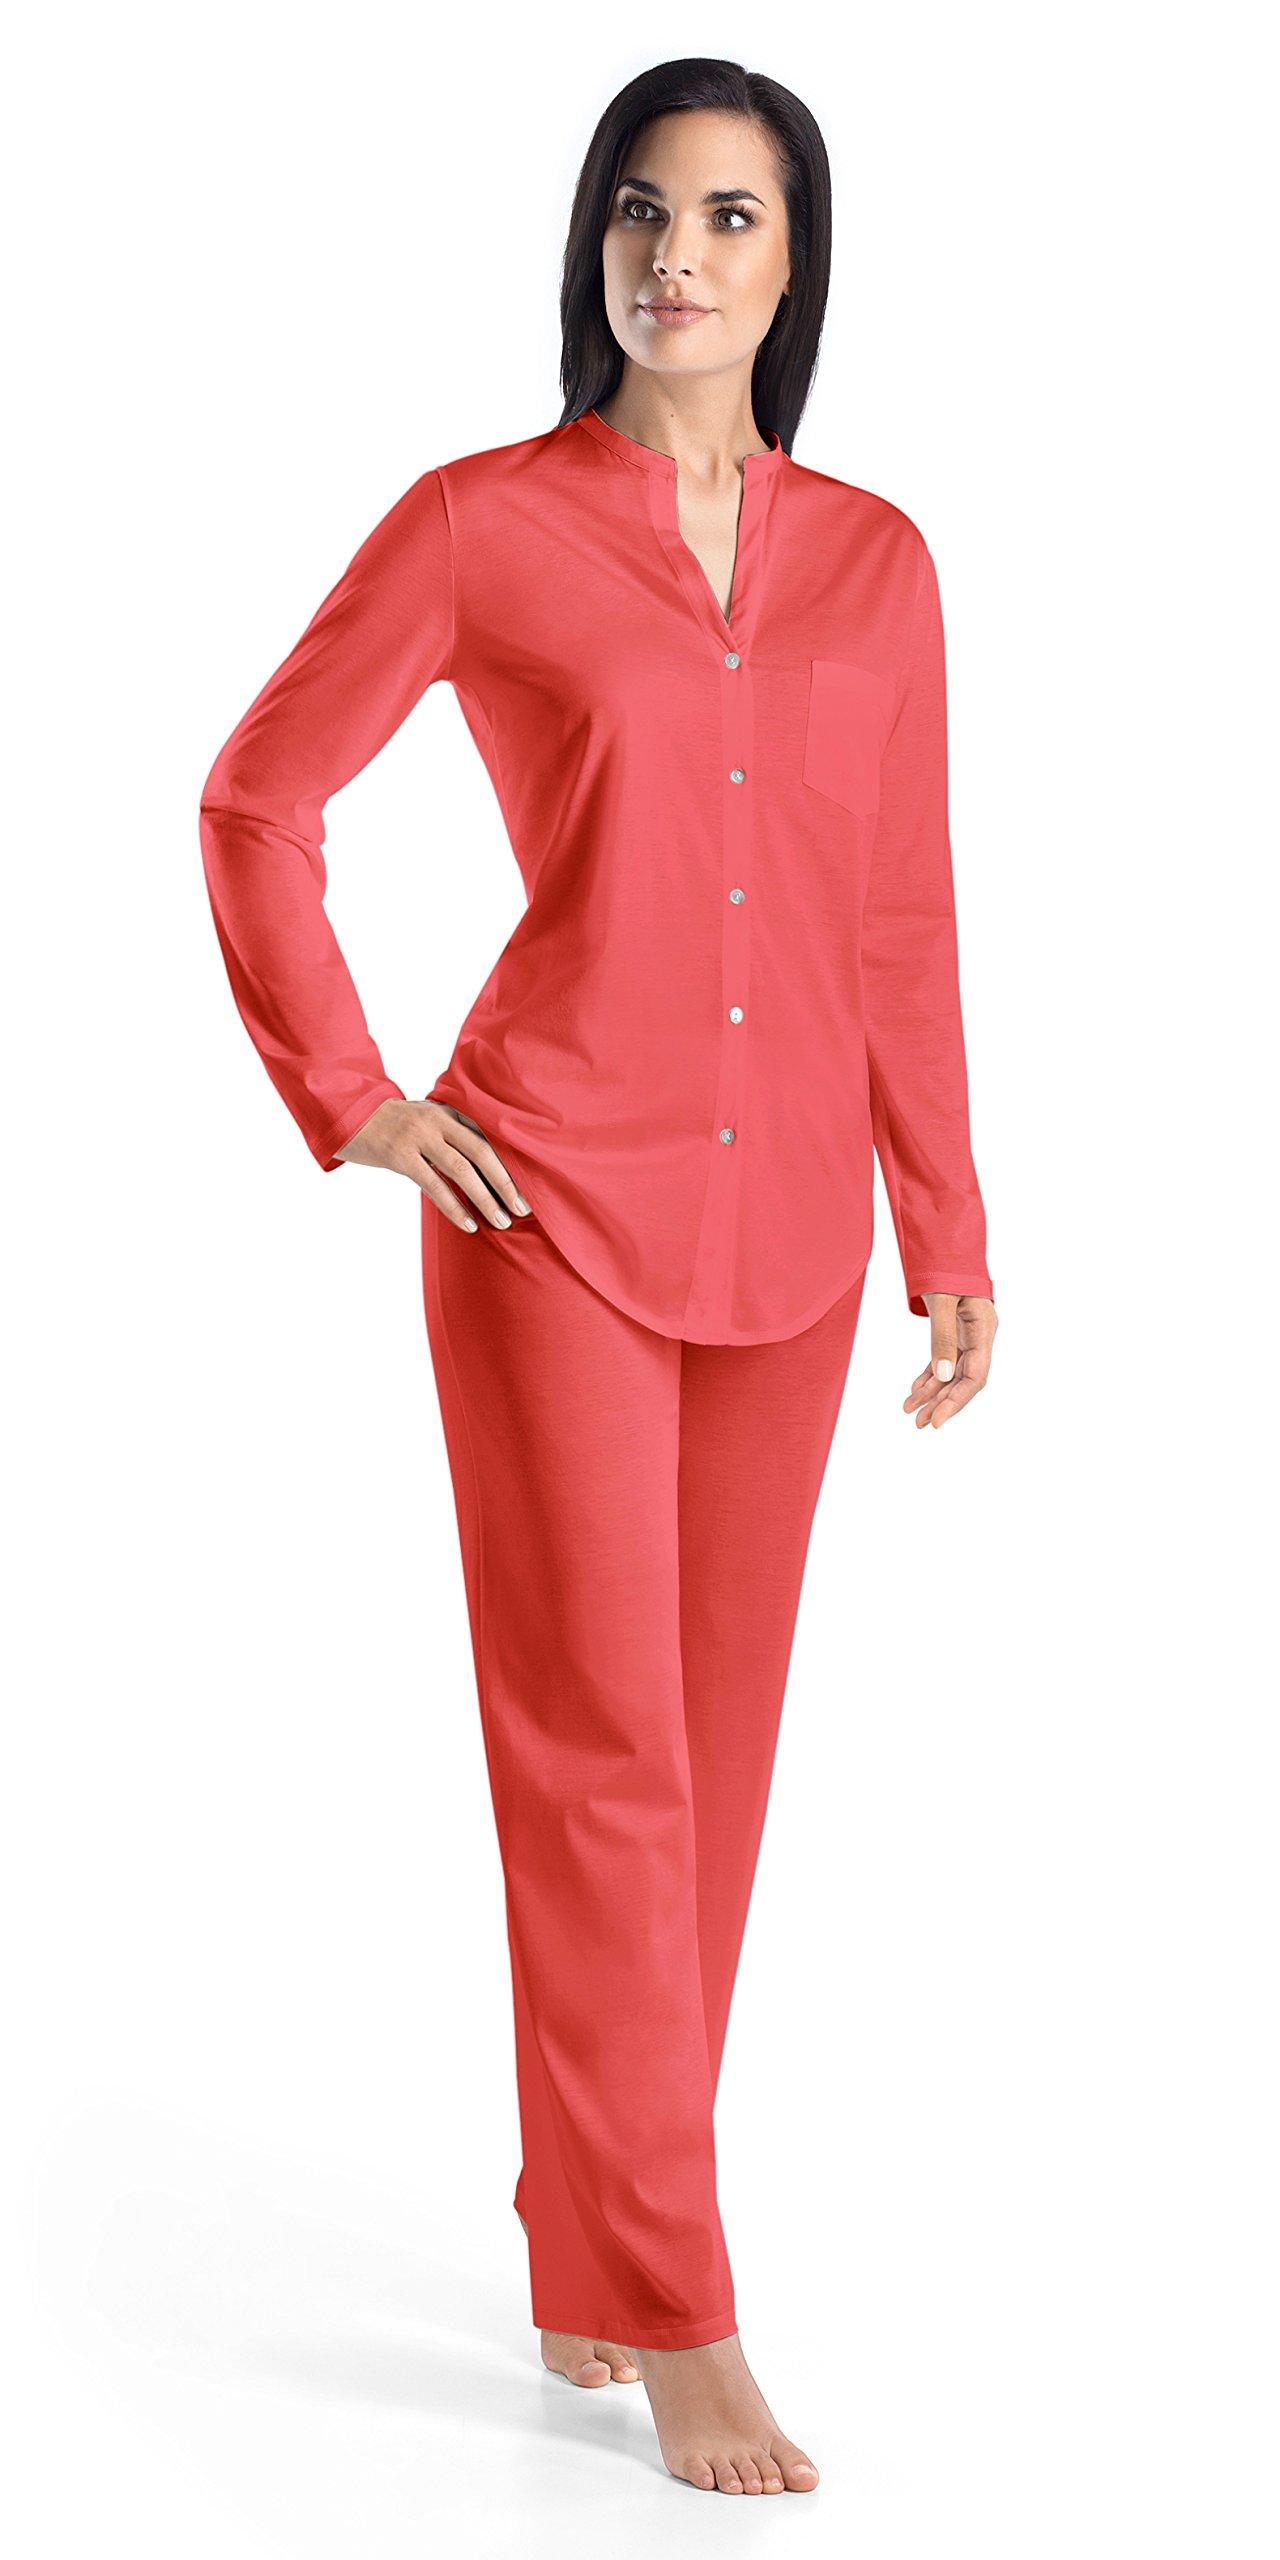 Hanro Women's Cotton Deluxe Long Sleeve Pajama Set, Grapefruit, Large